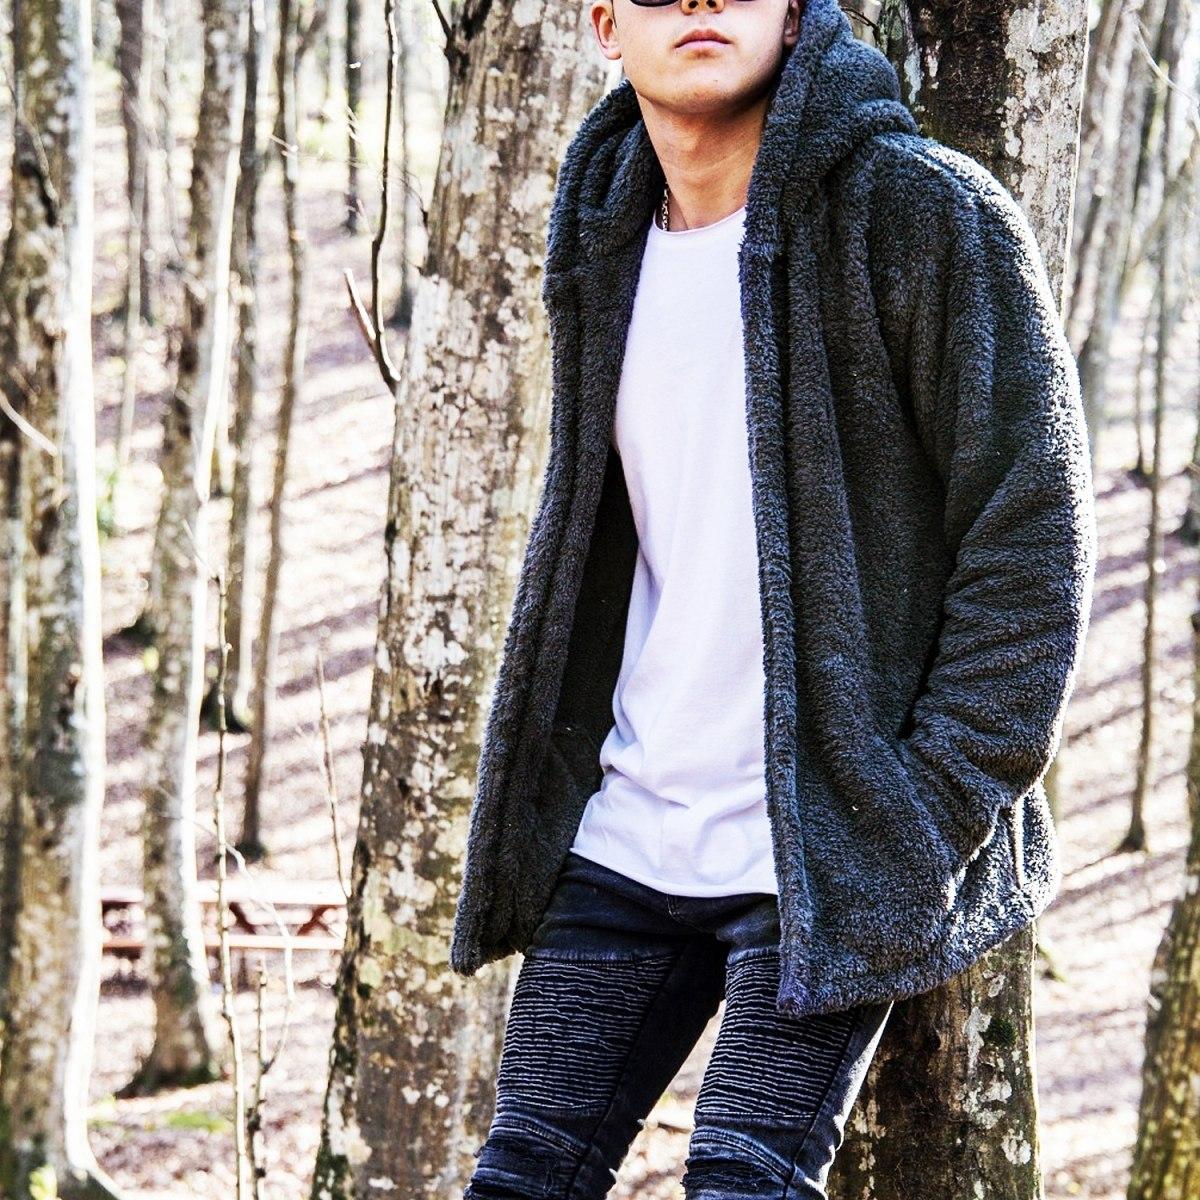 Men's Wellsoft Winter Furry Cardigan With Hood Black Mv Premium Brand - 3